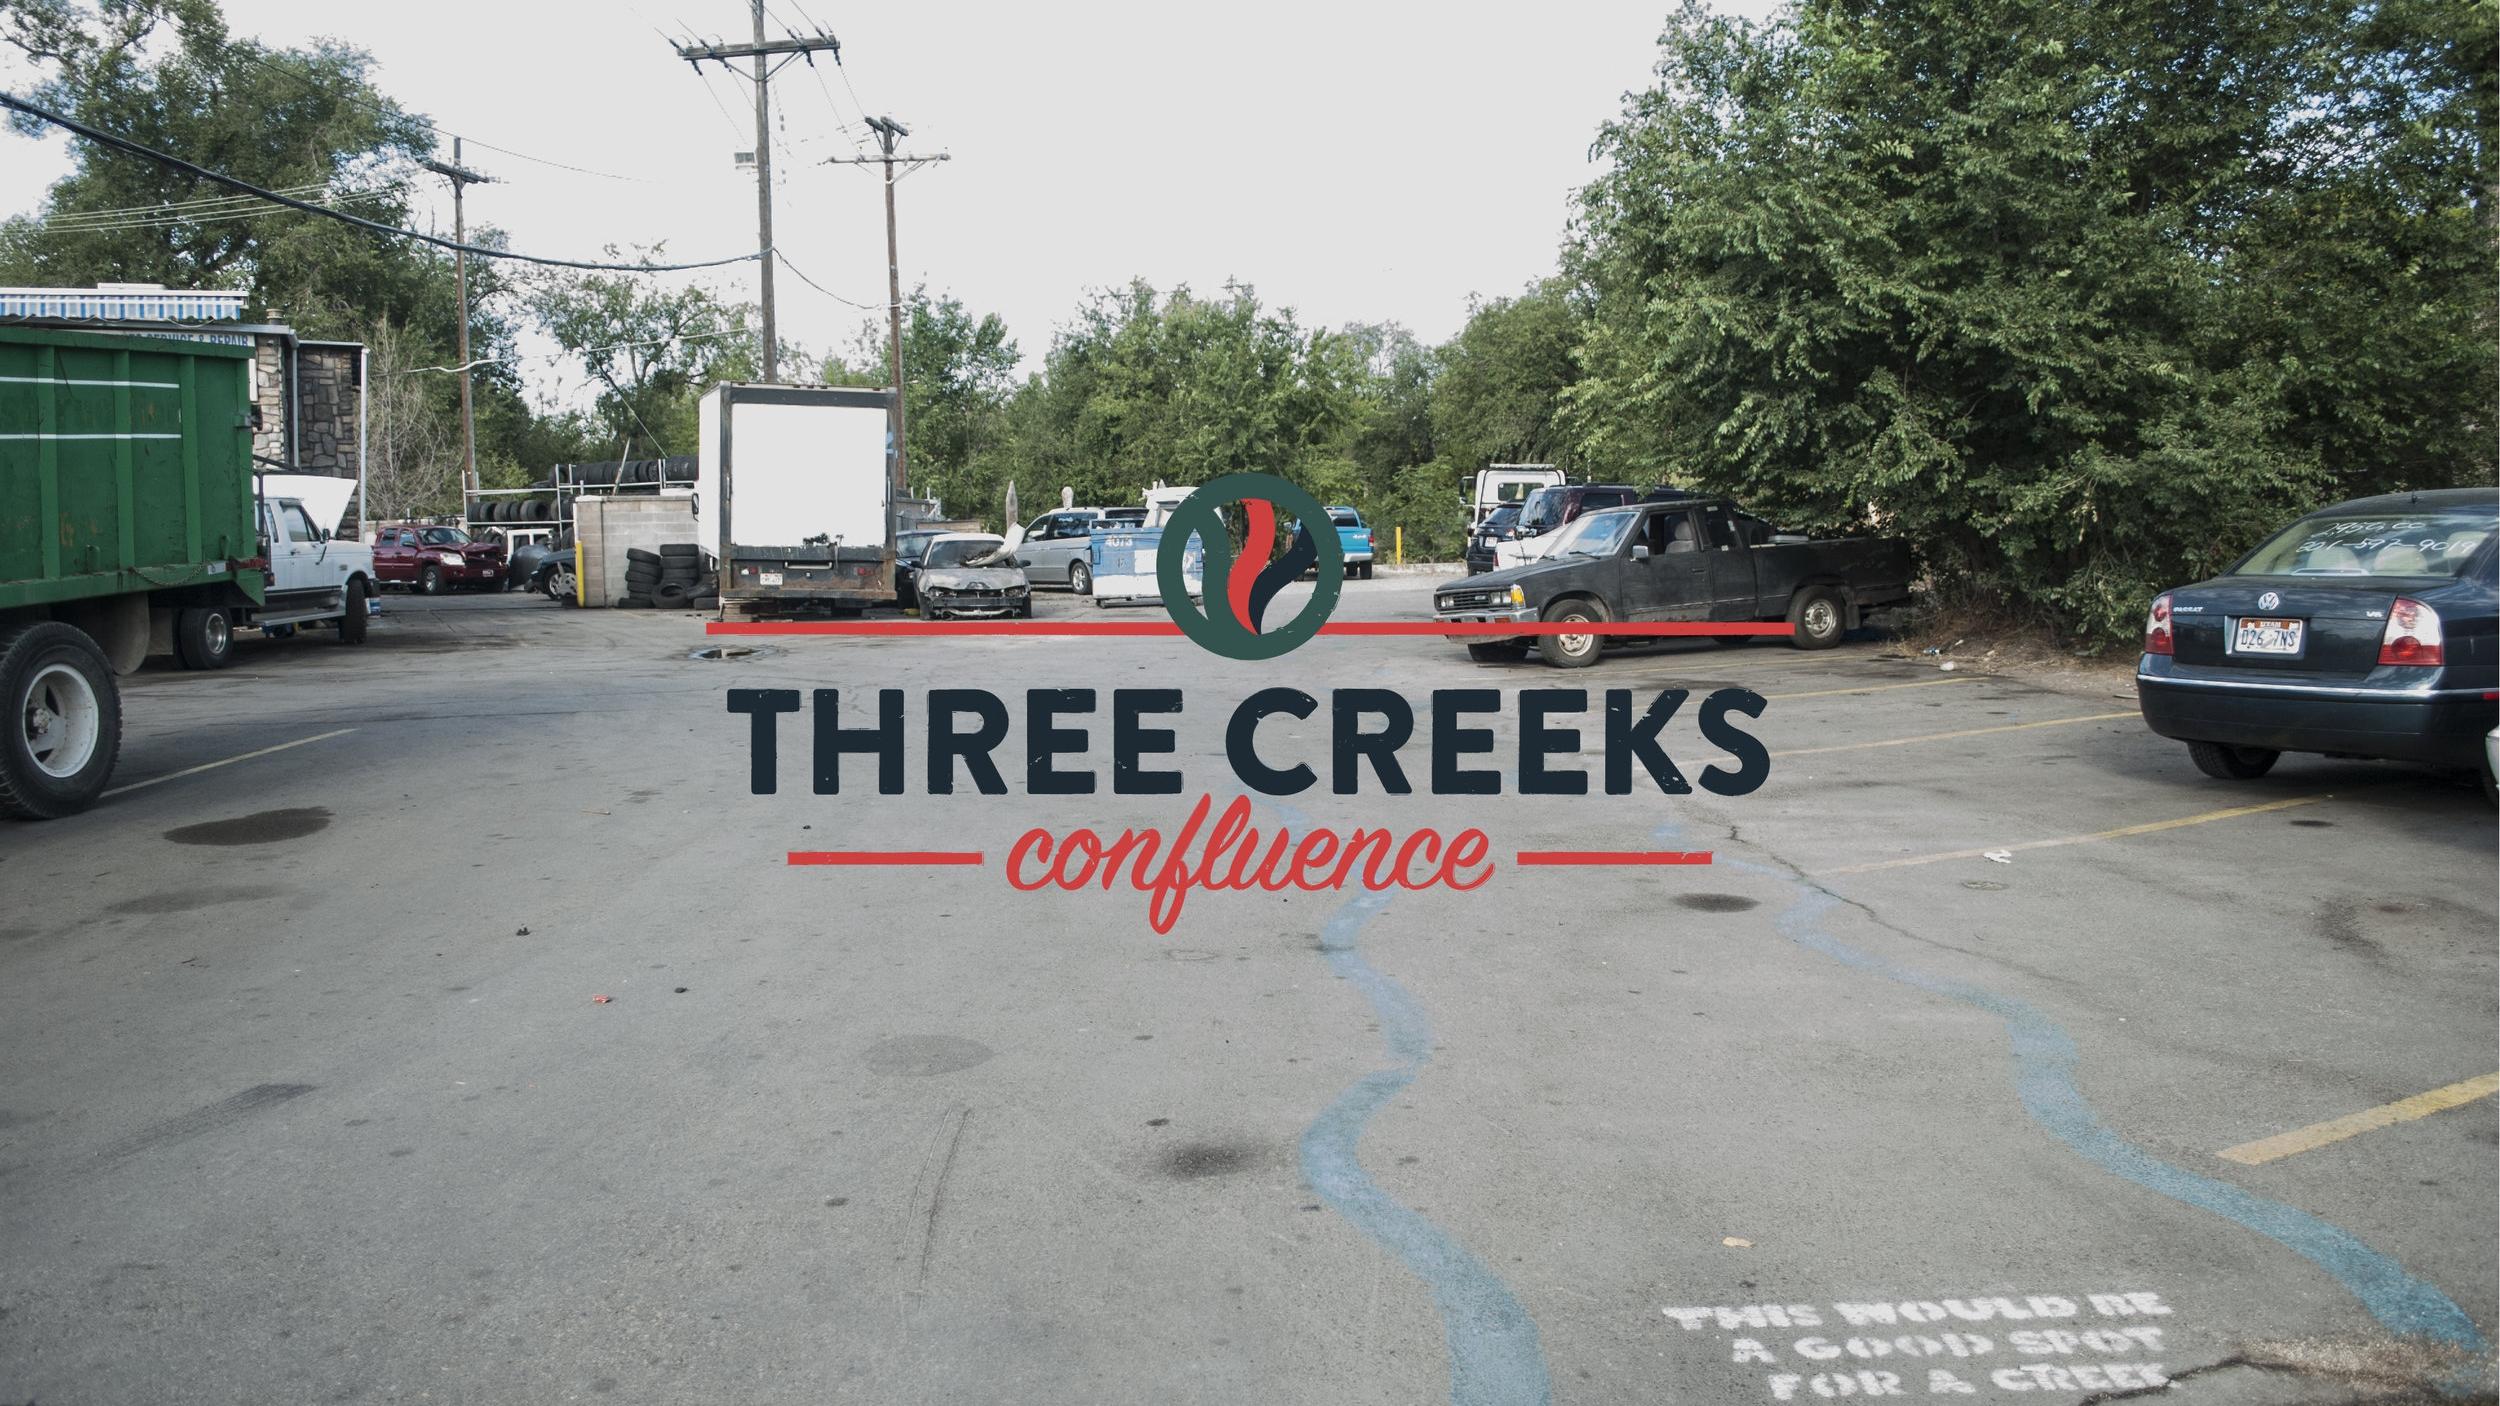 THREE CREEKS CONFLUENCE